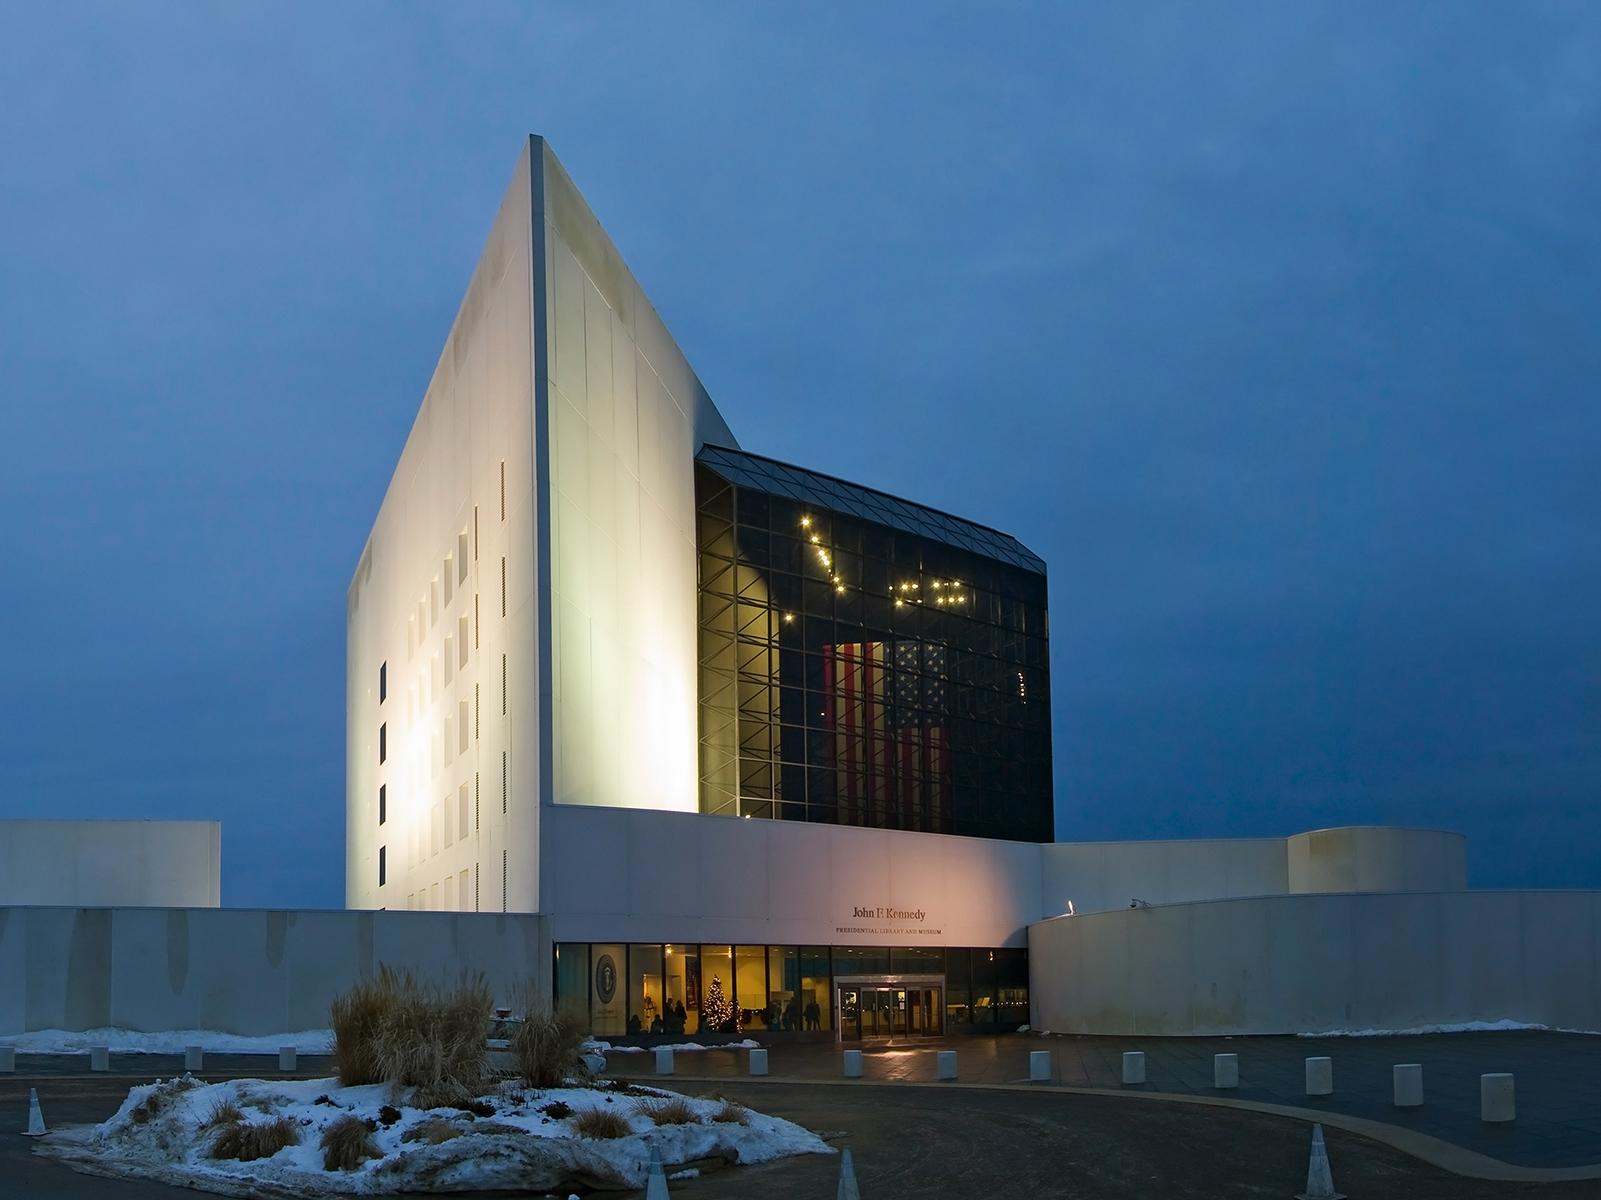 The John F Kennedy Library, Boston, MA (1979)